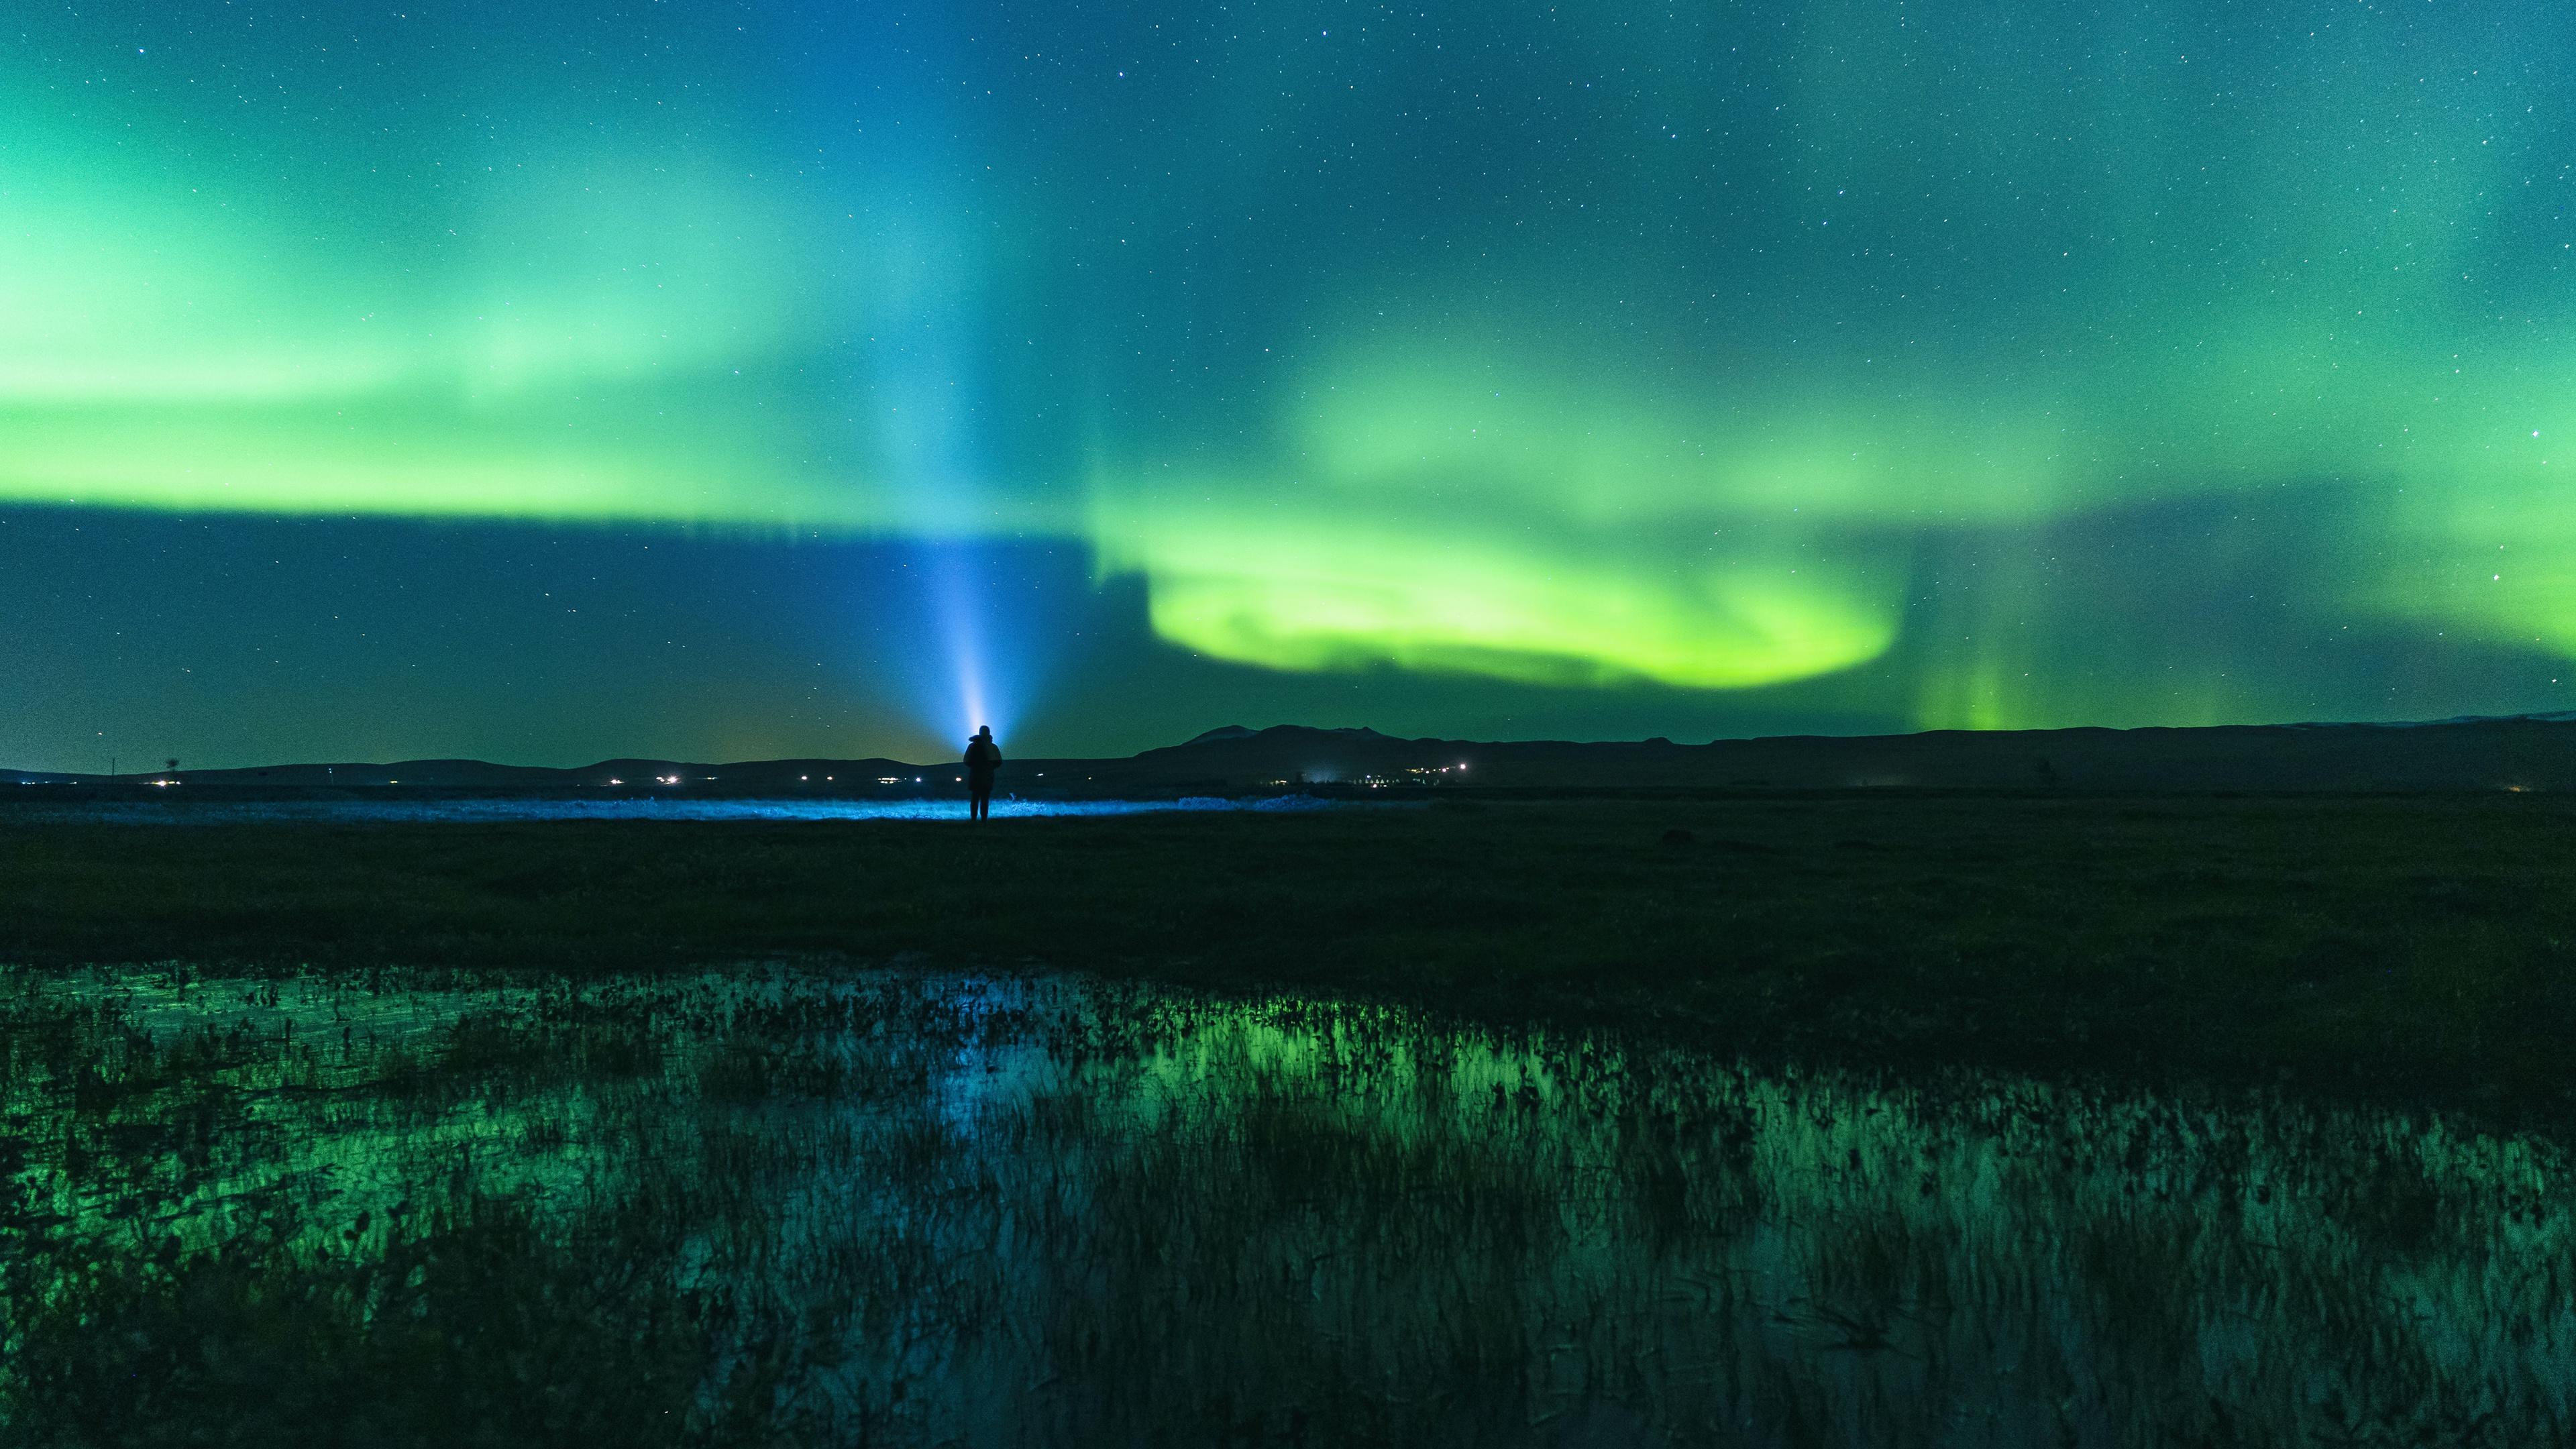 Aurora Borealis Man Night Norway Sky Stars 3840x2160